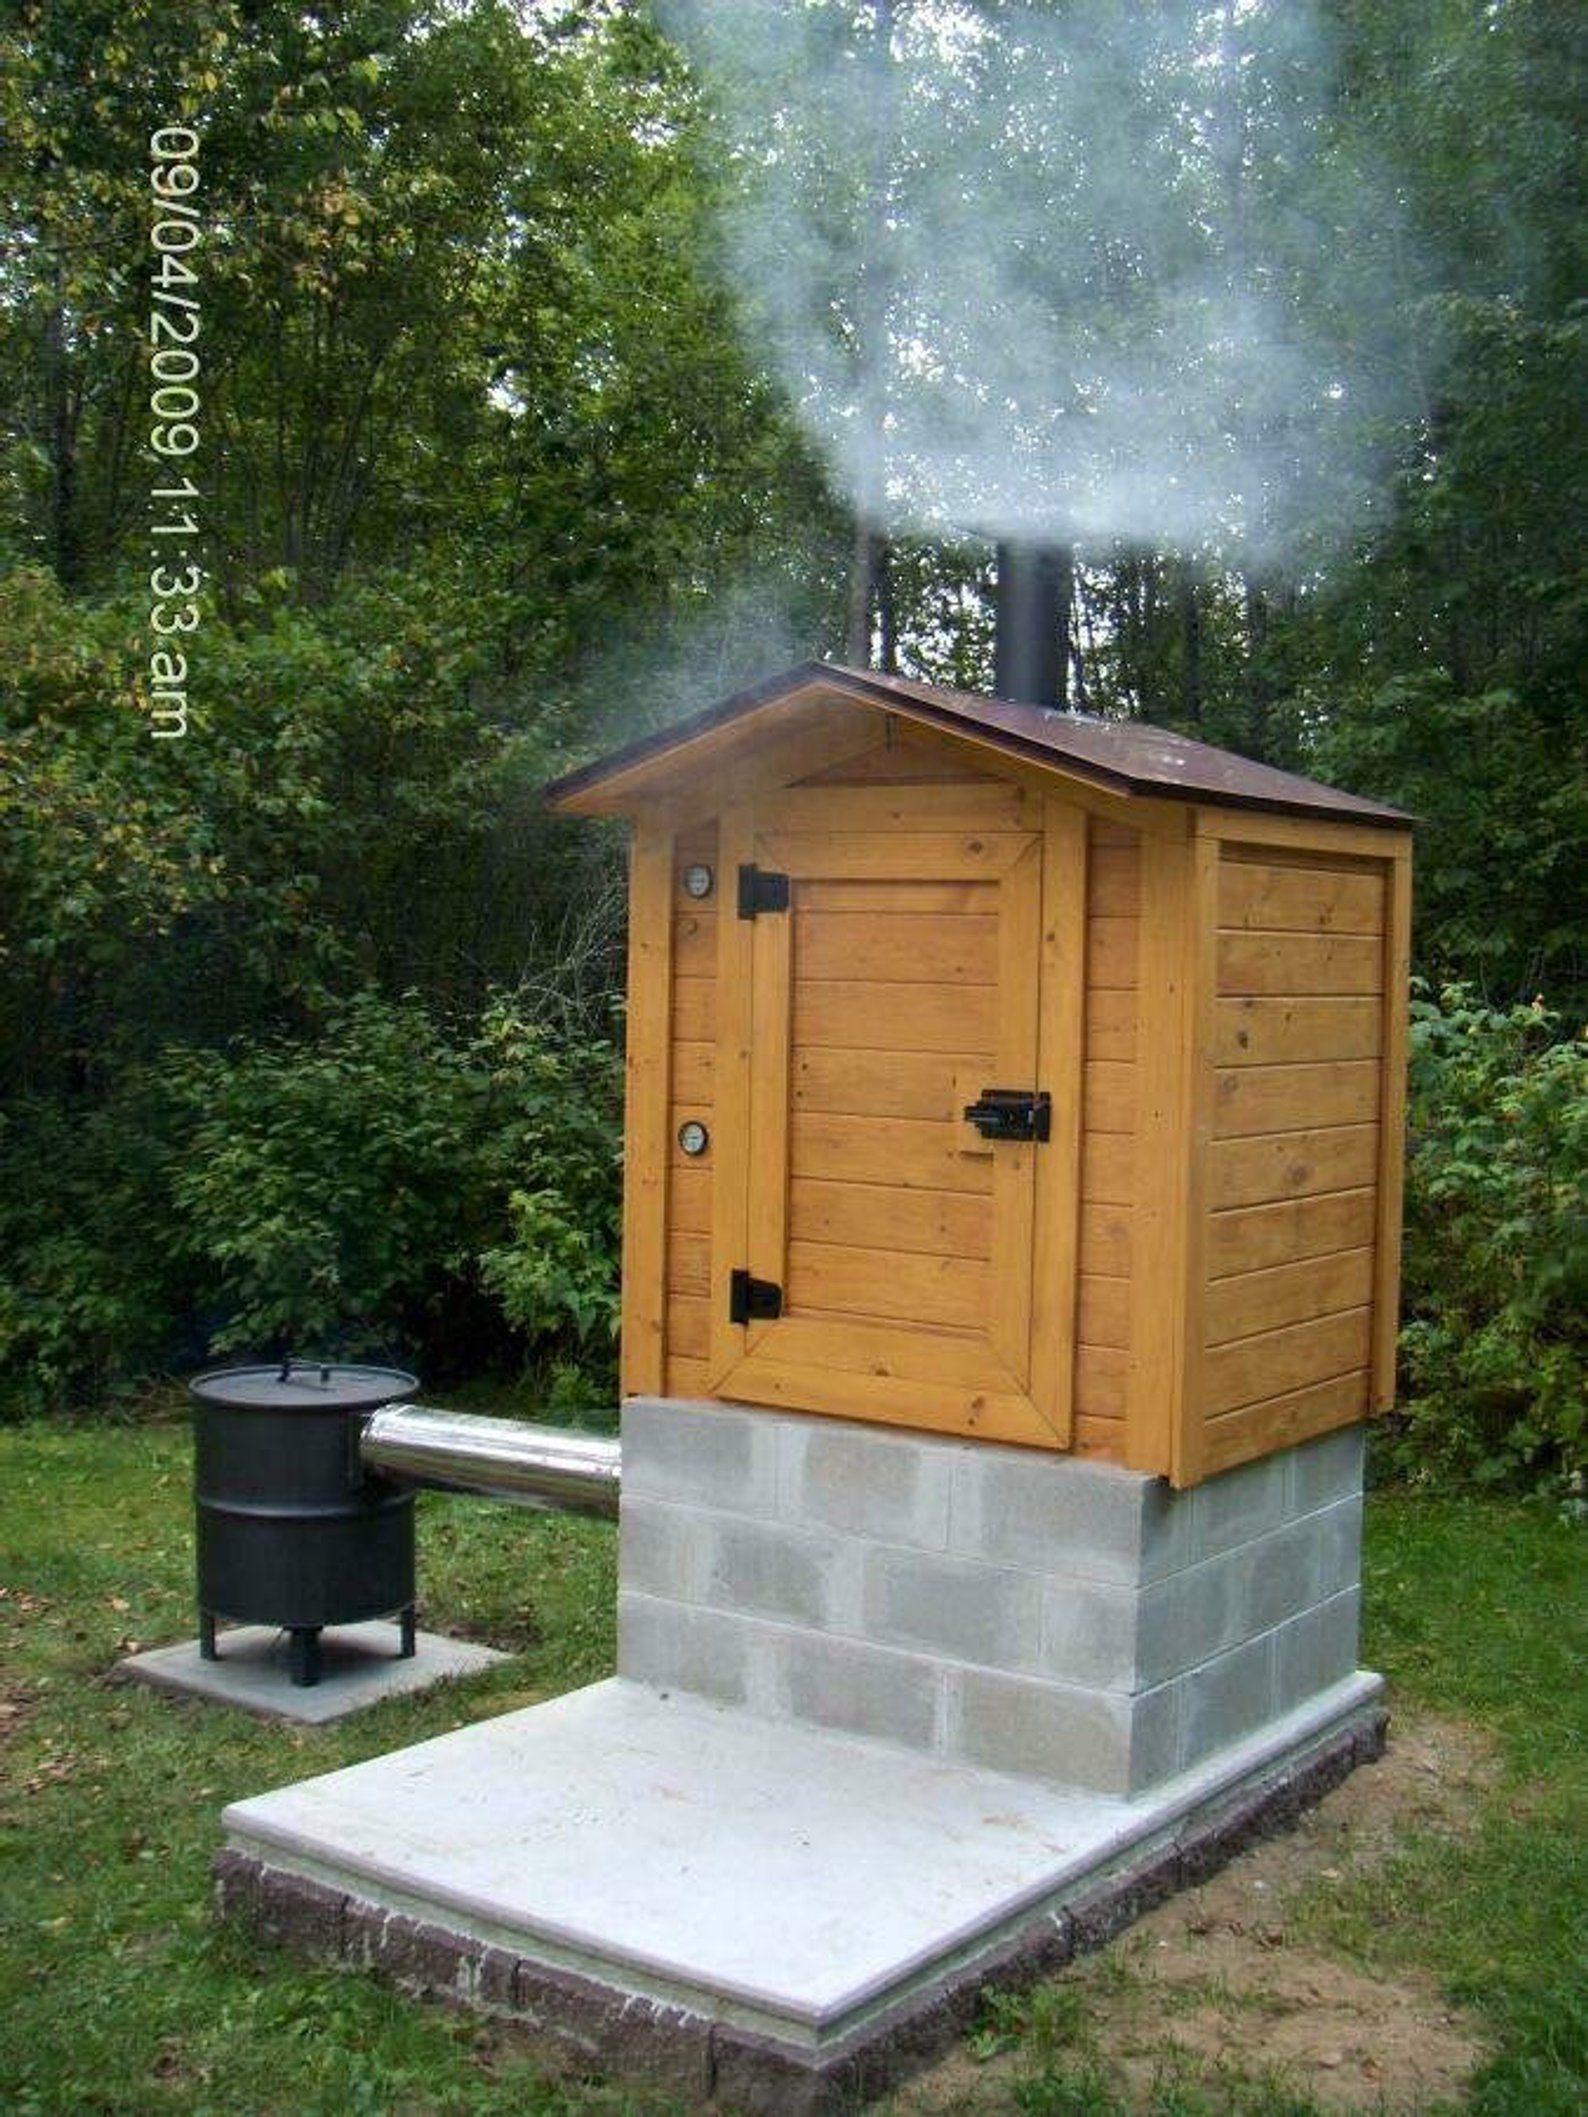 Smokehouse Plans 8' x 6' Smoker Smoke House Building Plan ...